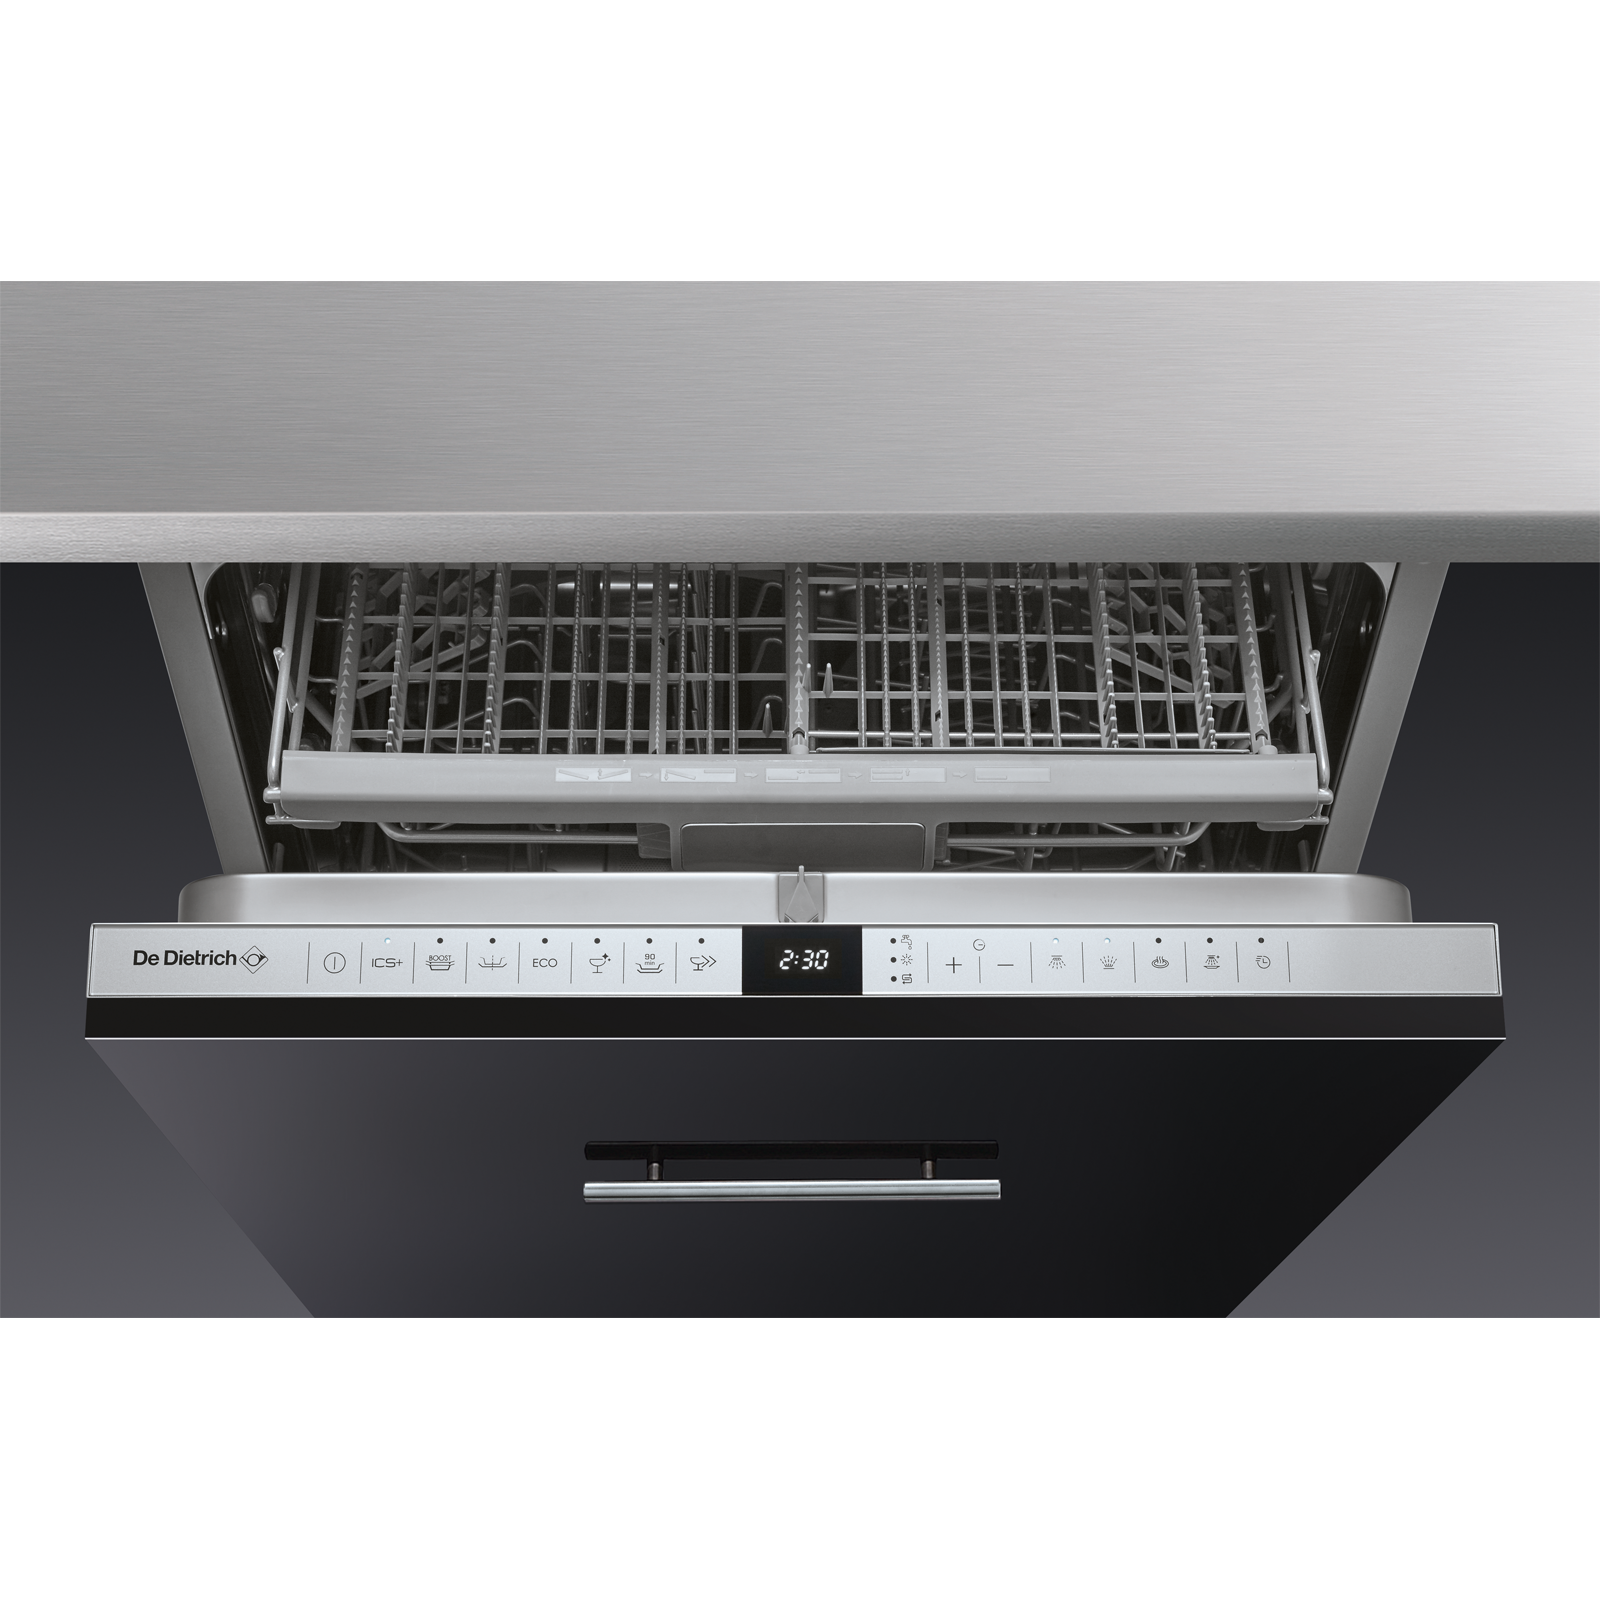 Built in Dishwasher DVH15423J De Dietrich